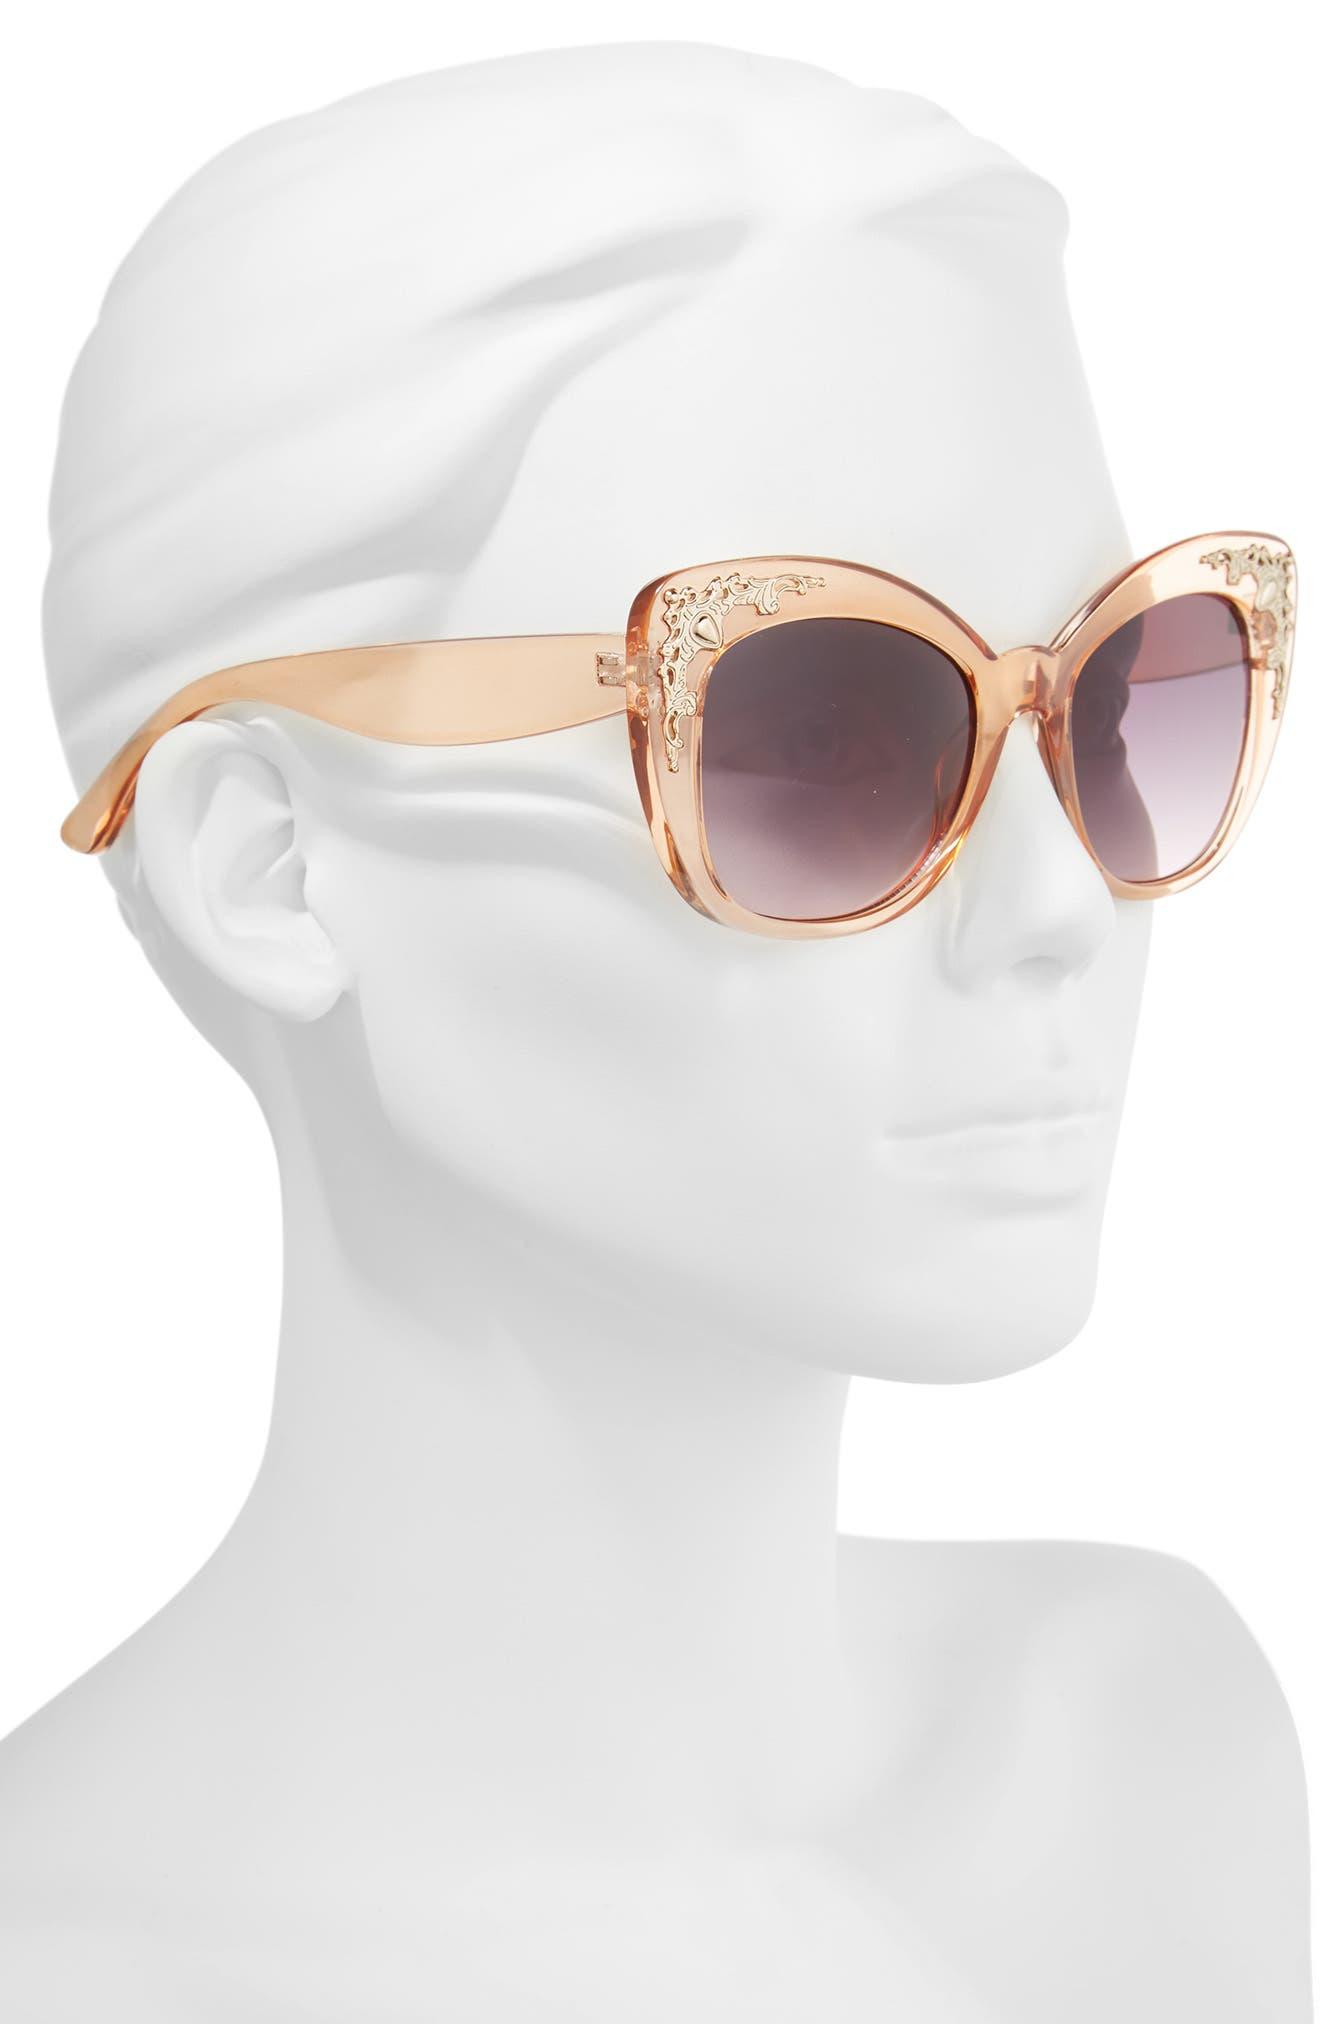 54mm Embellished Cat Eye Sunglasses,                             Alternate thumbnail 2, color,                             710